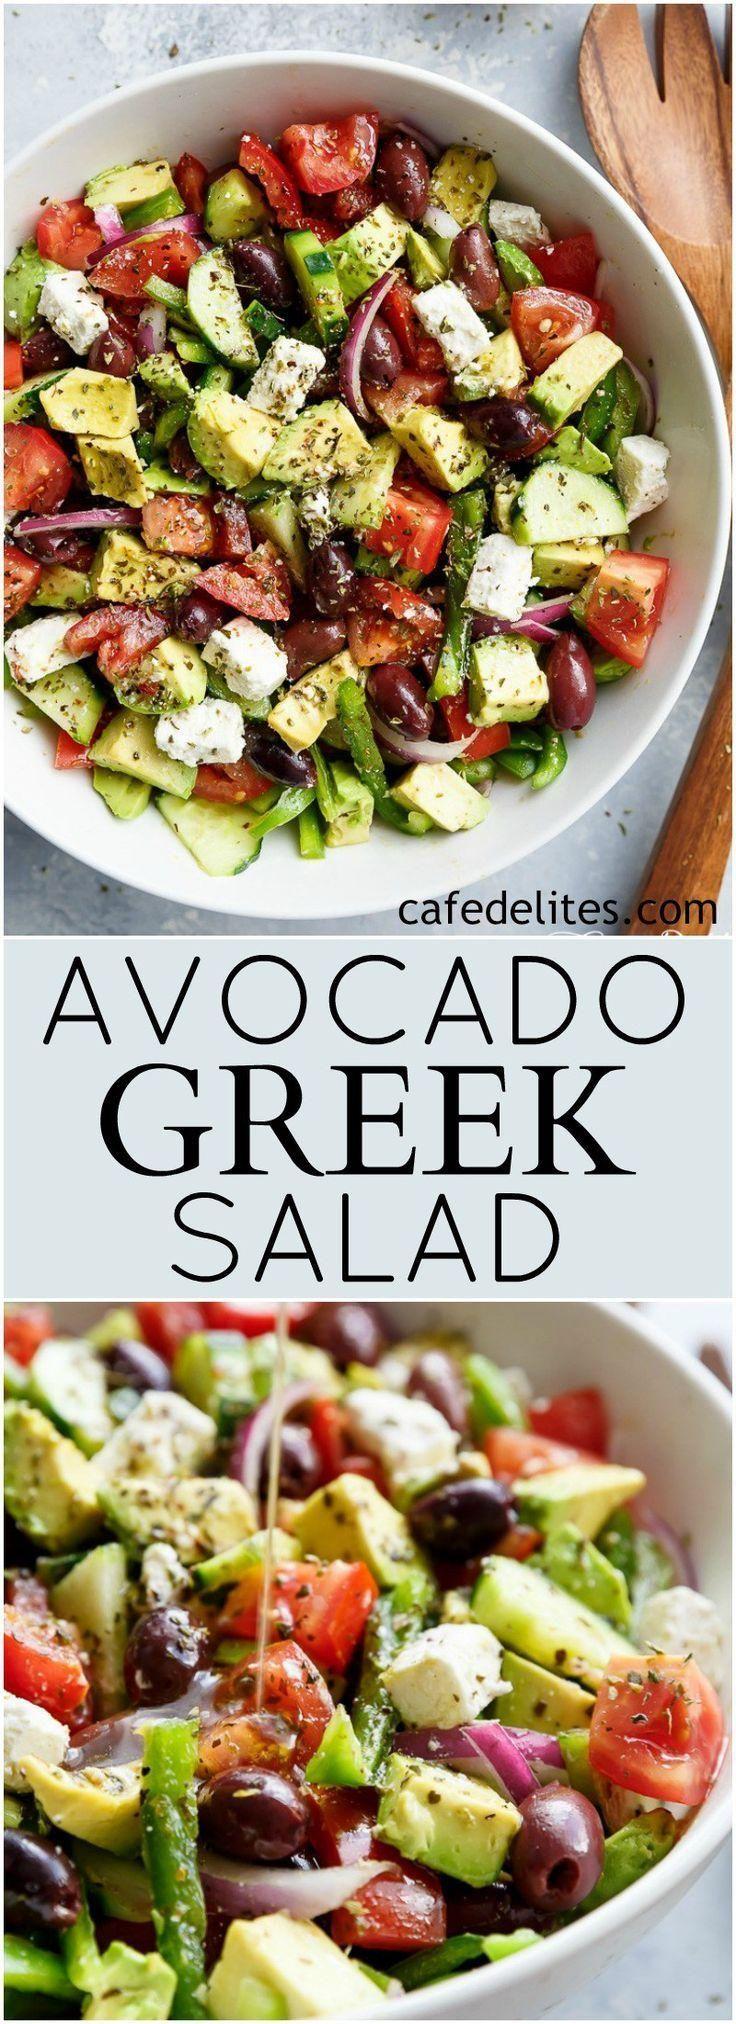 Avocado Greek Salad with a Greek Salad Dressing is a family favourite side salad... - Avocado -